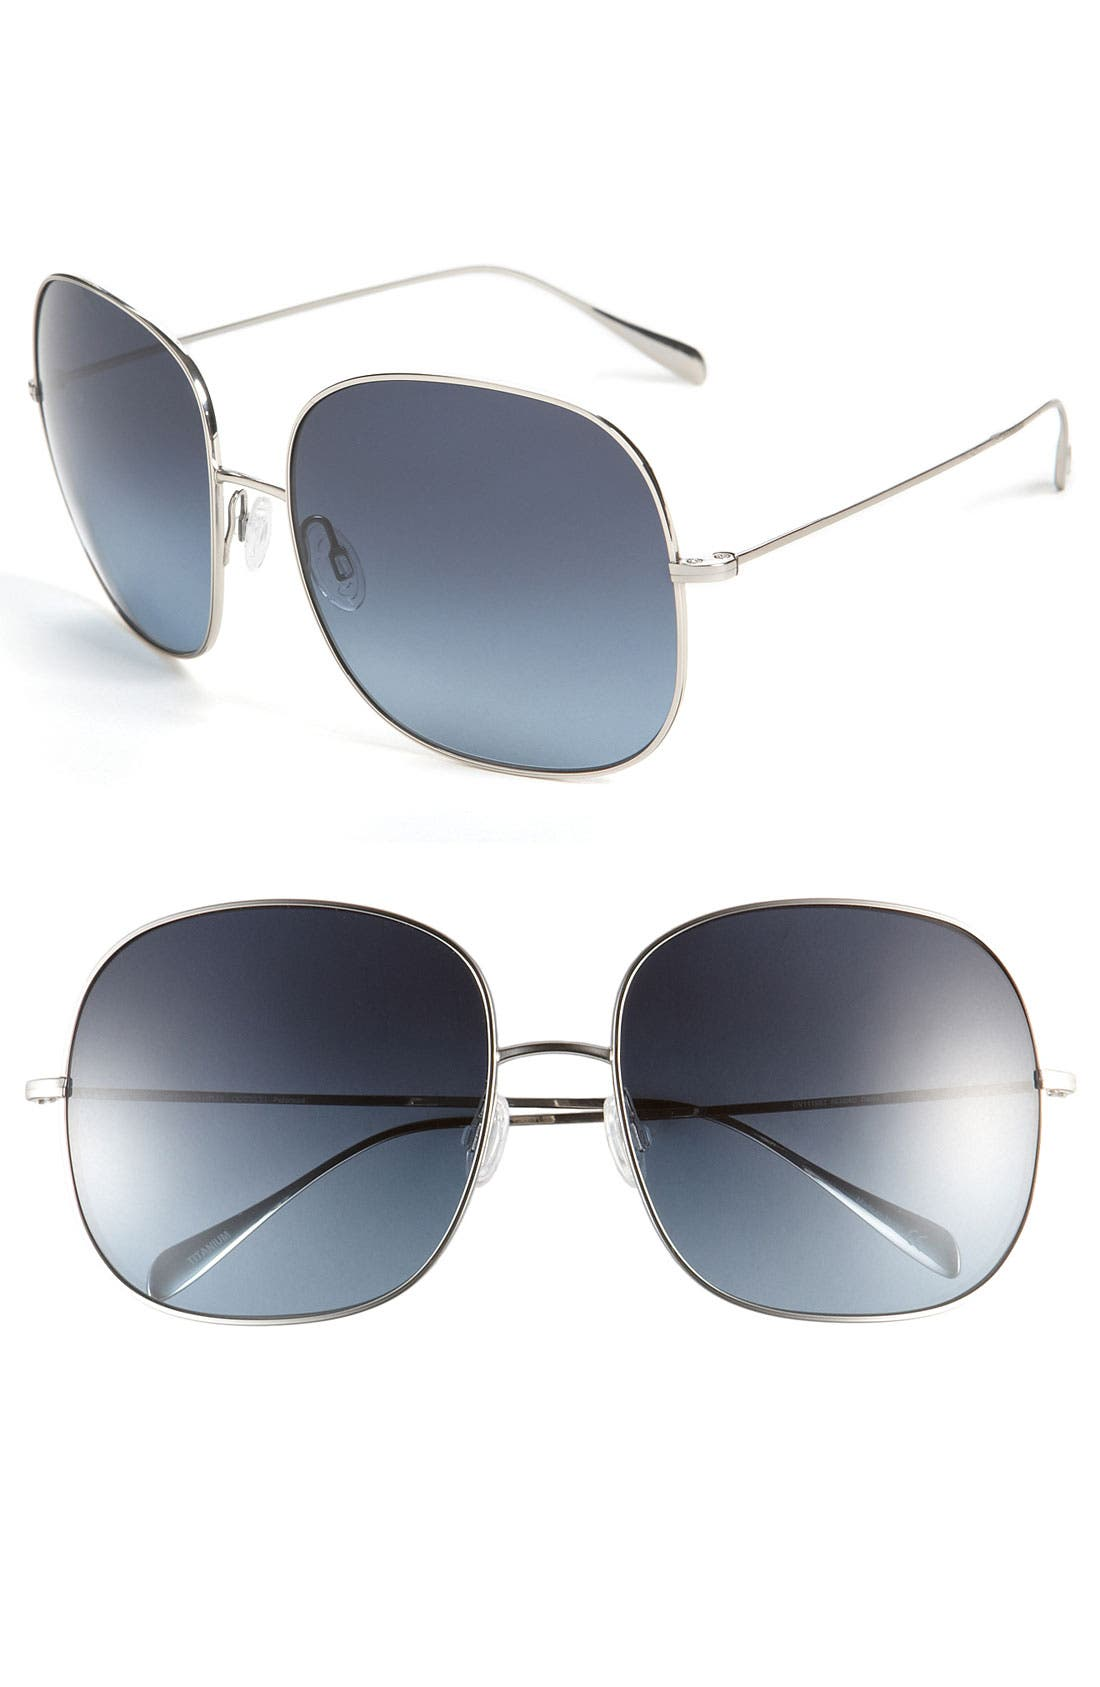 Main Image - Oliver Peoples Polarized Sunglasses